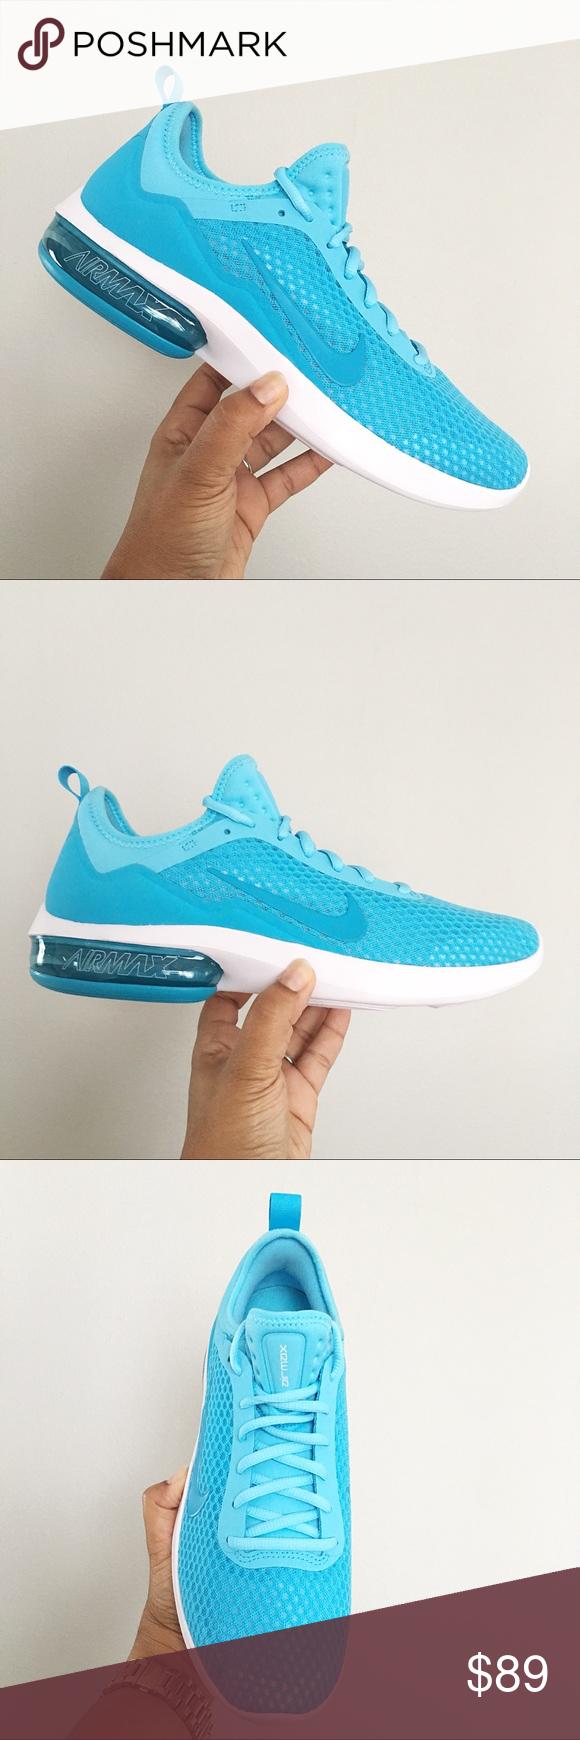 be5c8378ae6840 Nike Air Max Kantara Men s Running Shoes Size 9.5 Brand New with Box no  lid. Nike 908992 400 Lagoon Pulse  light blue fury Women 11   Men s 9.5 Nike  Shoes ...